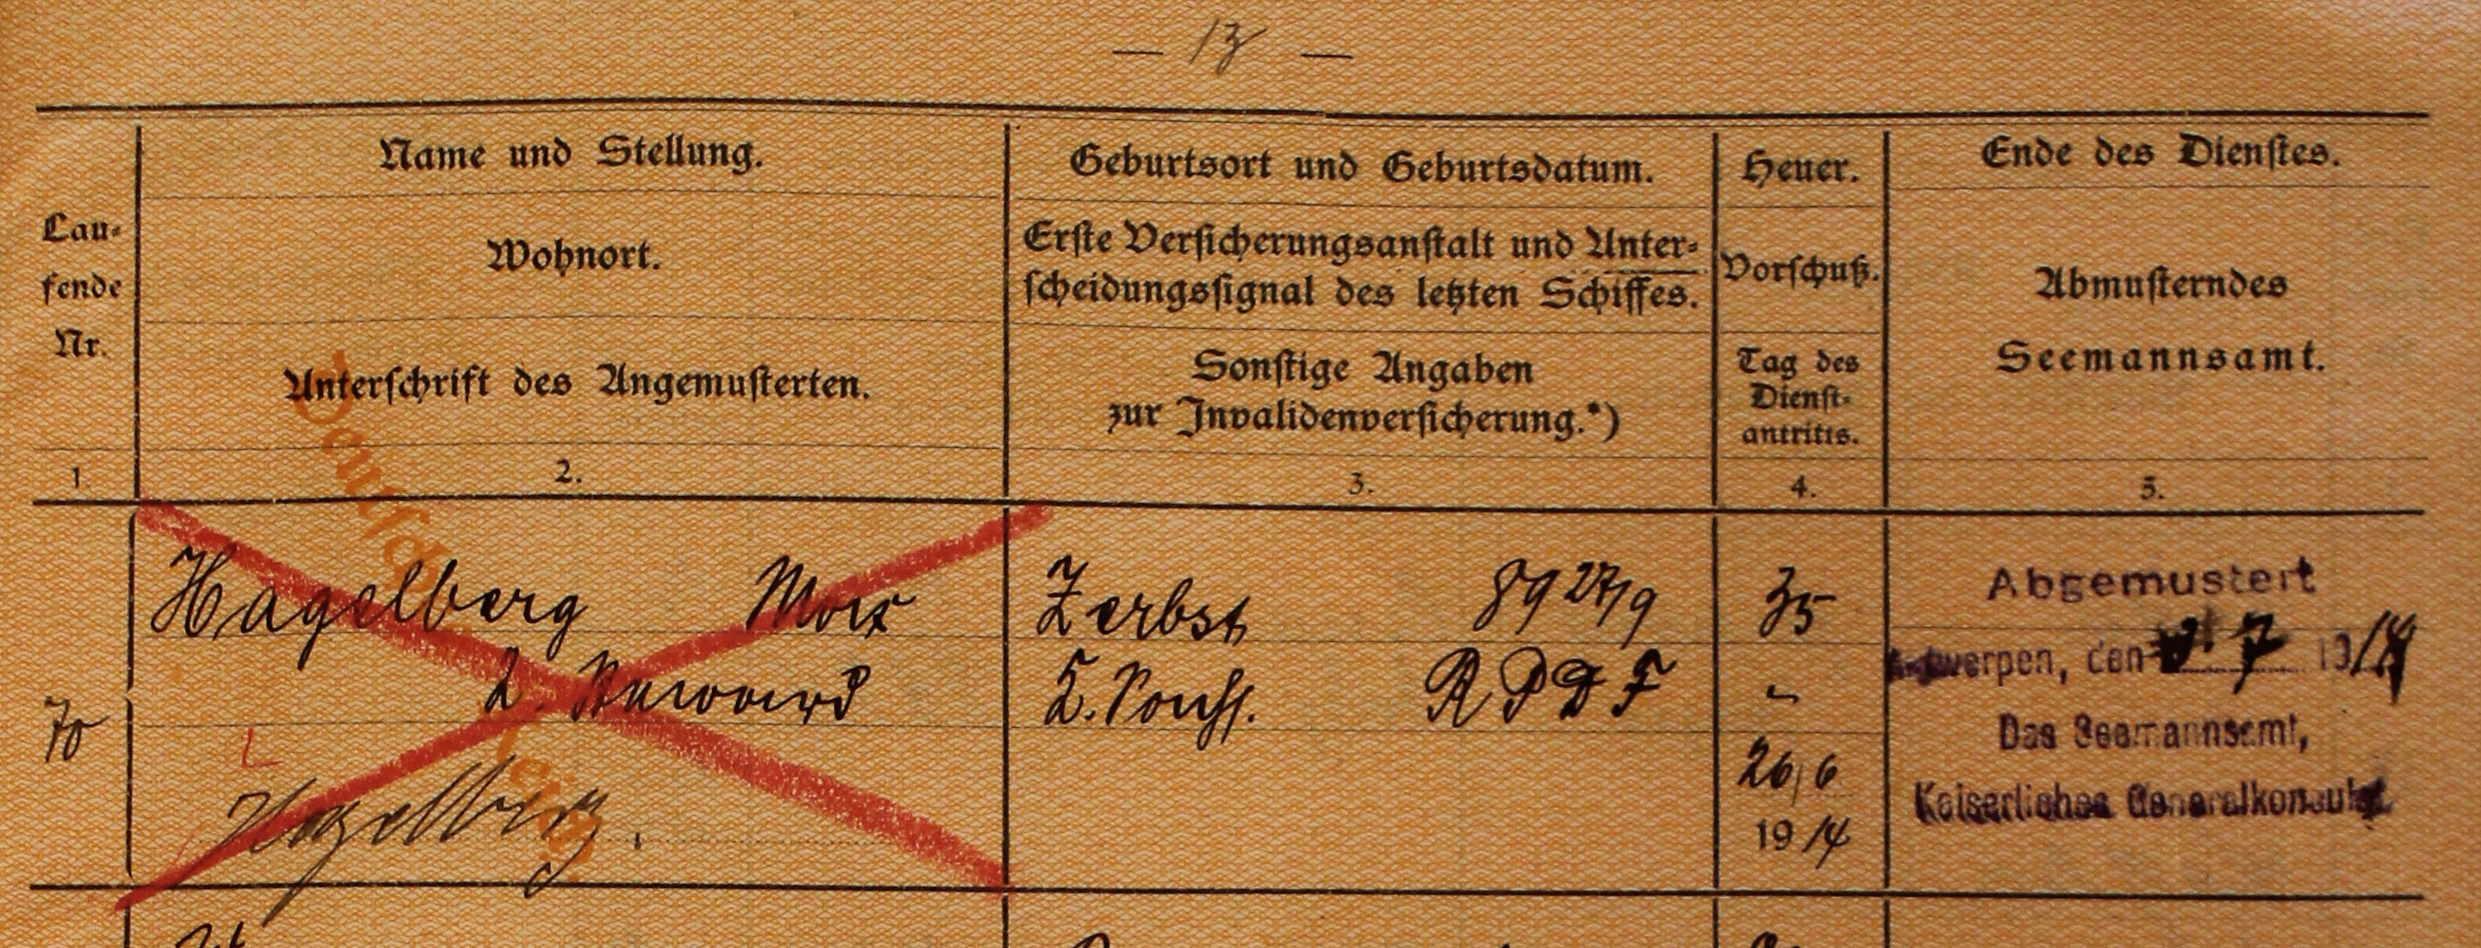 ship's articles, Neumunster 1914, Max Hagelberg